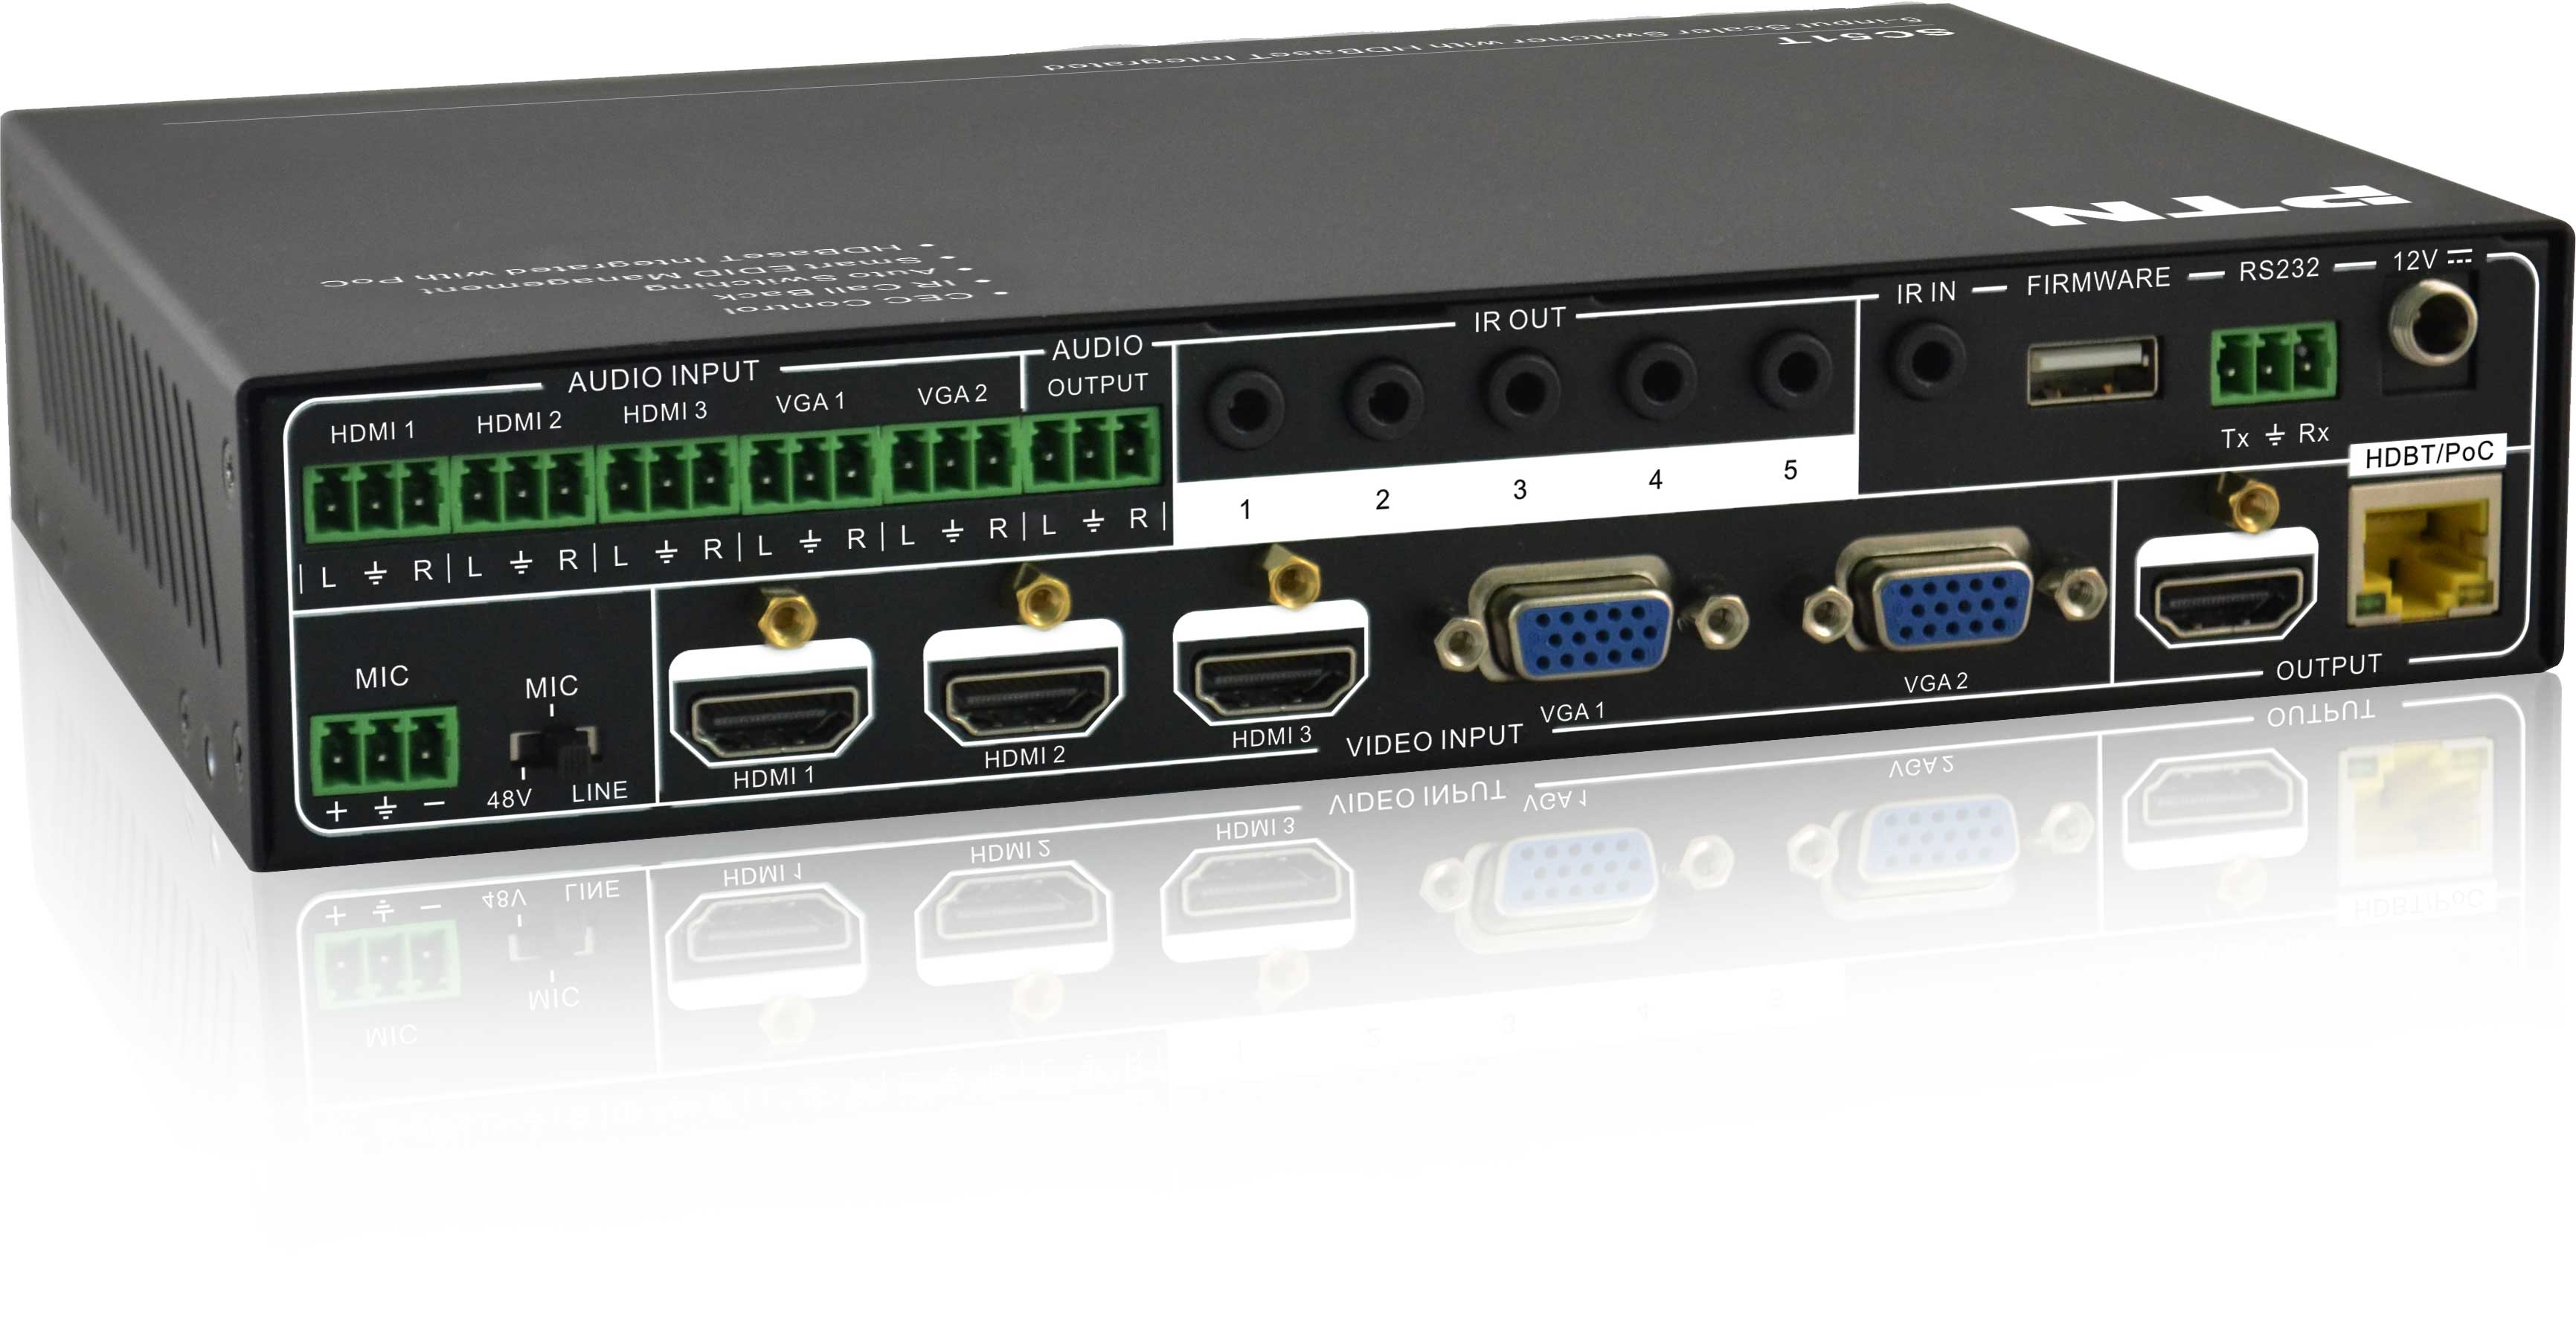 SCA51TS - Selecteur scaleur 5 vers 1 HDBT /HDMI